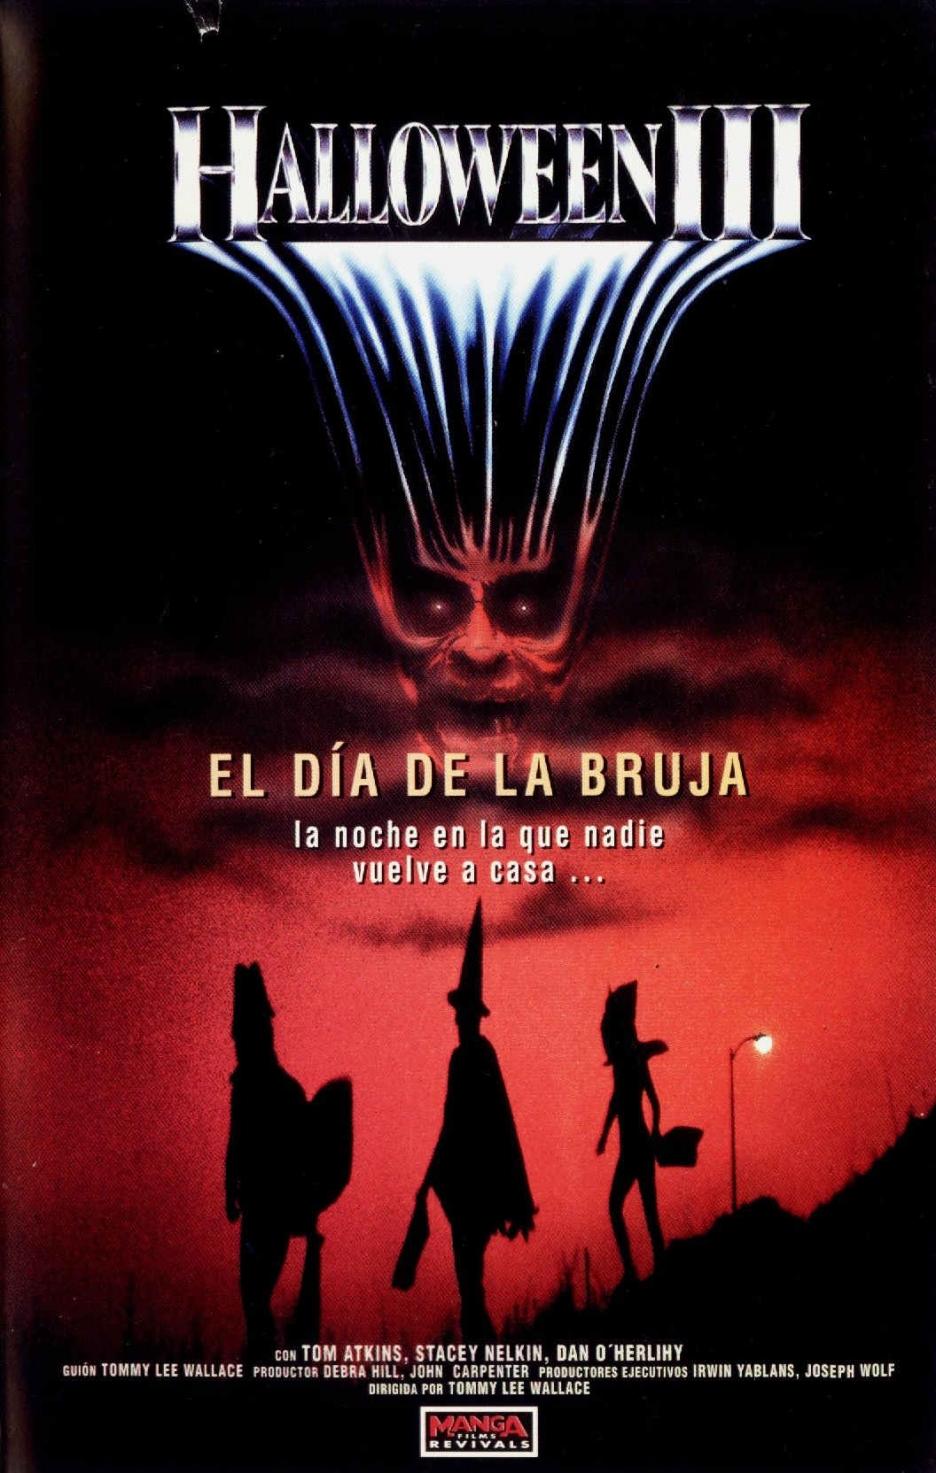 Halloween III: Season of the Witch (USA, 1982) – HORRORPEDIA